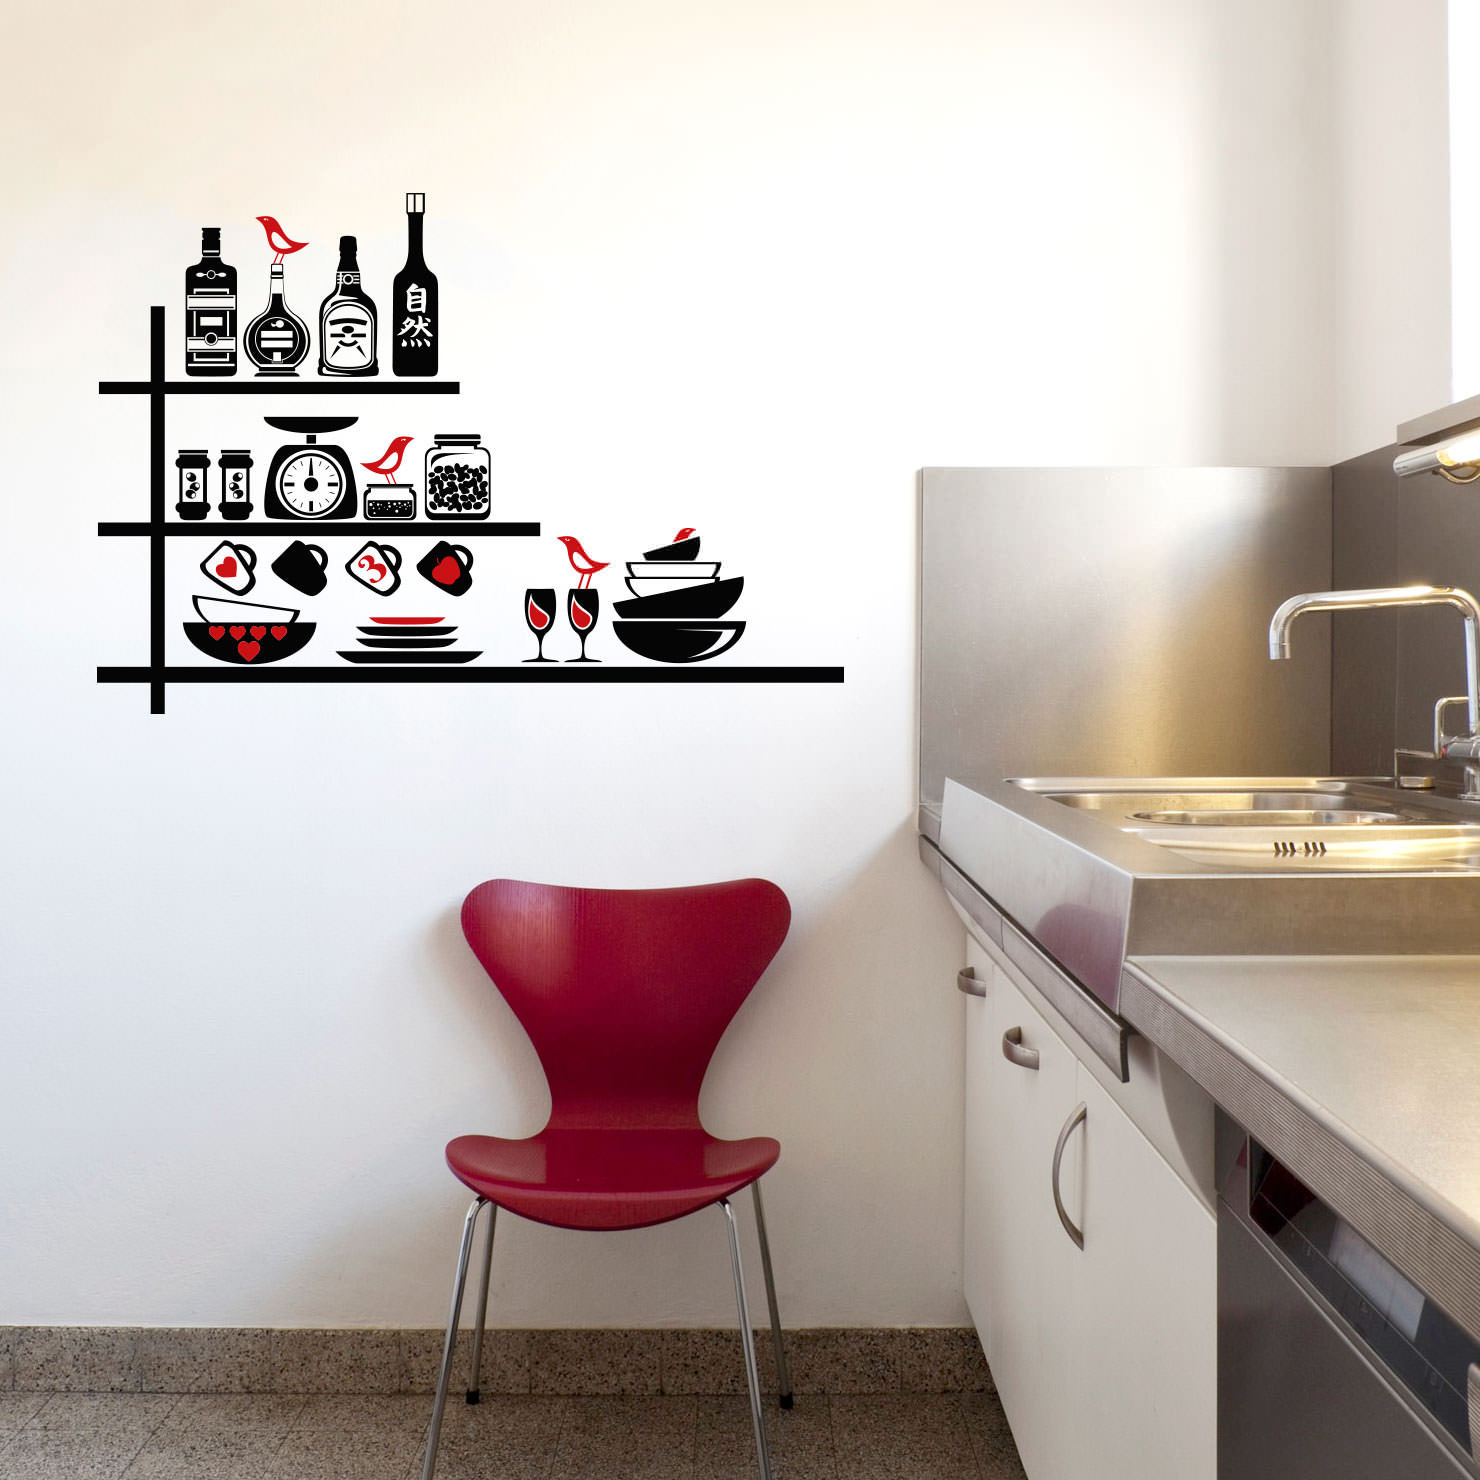 Adesivo de Parede Utensílios de Cozinha bemColar Adesivos De Parede